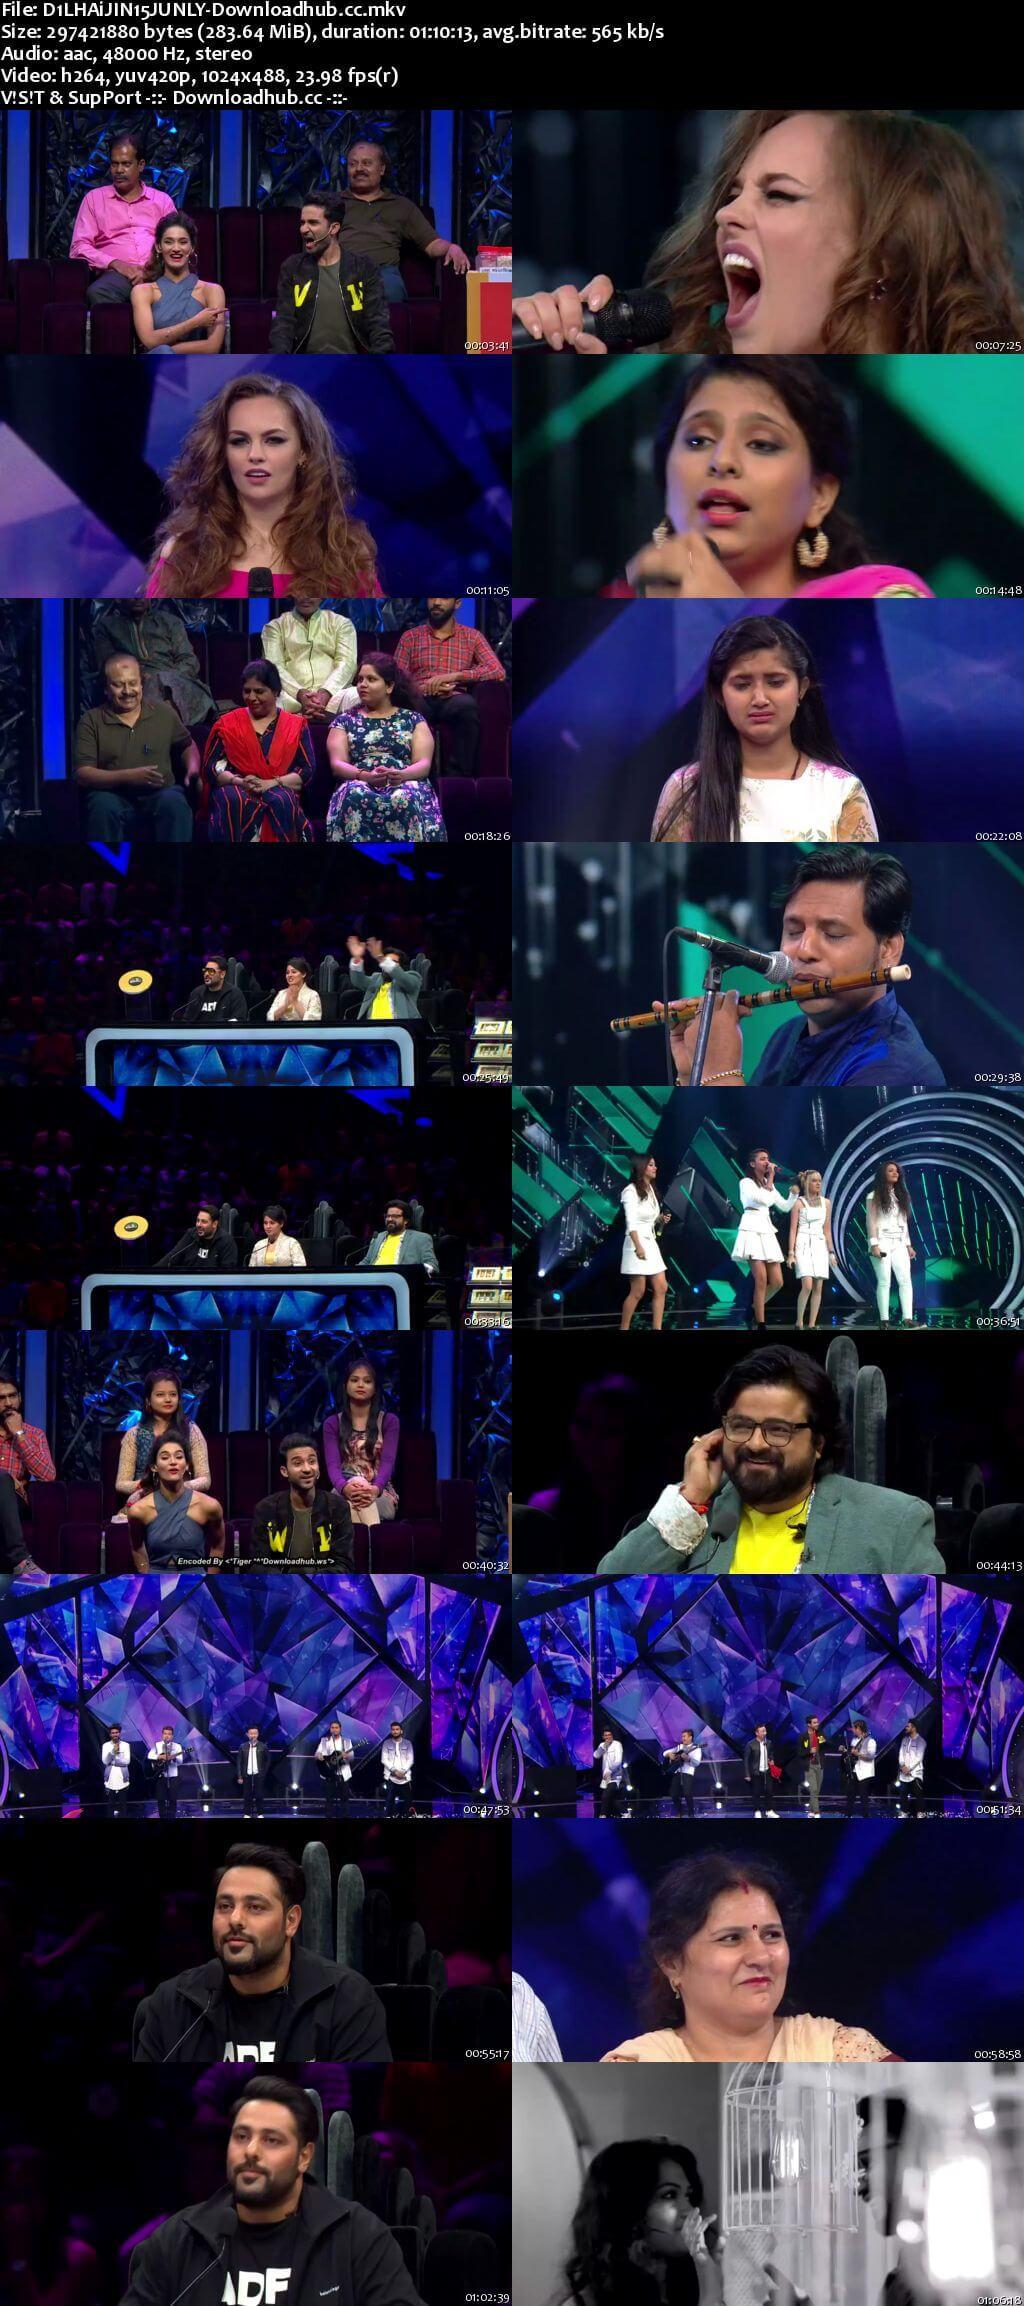 Dil Hai Hindustani 2 15 July 2018 Episode 04 HDTV 480p